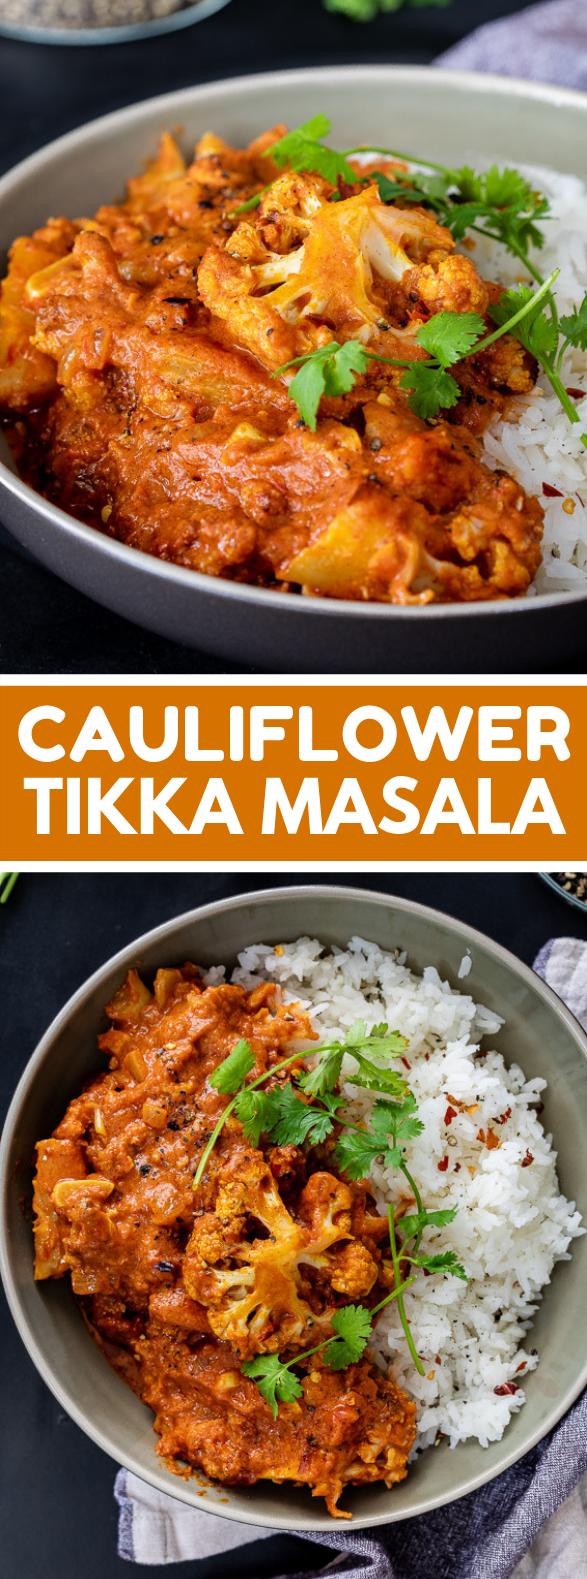 EASY CAULIFLOWER TIKKA MASALA CURRY #veggies #sauce